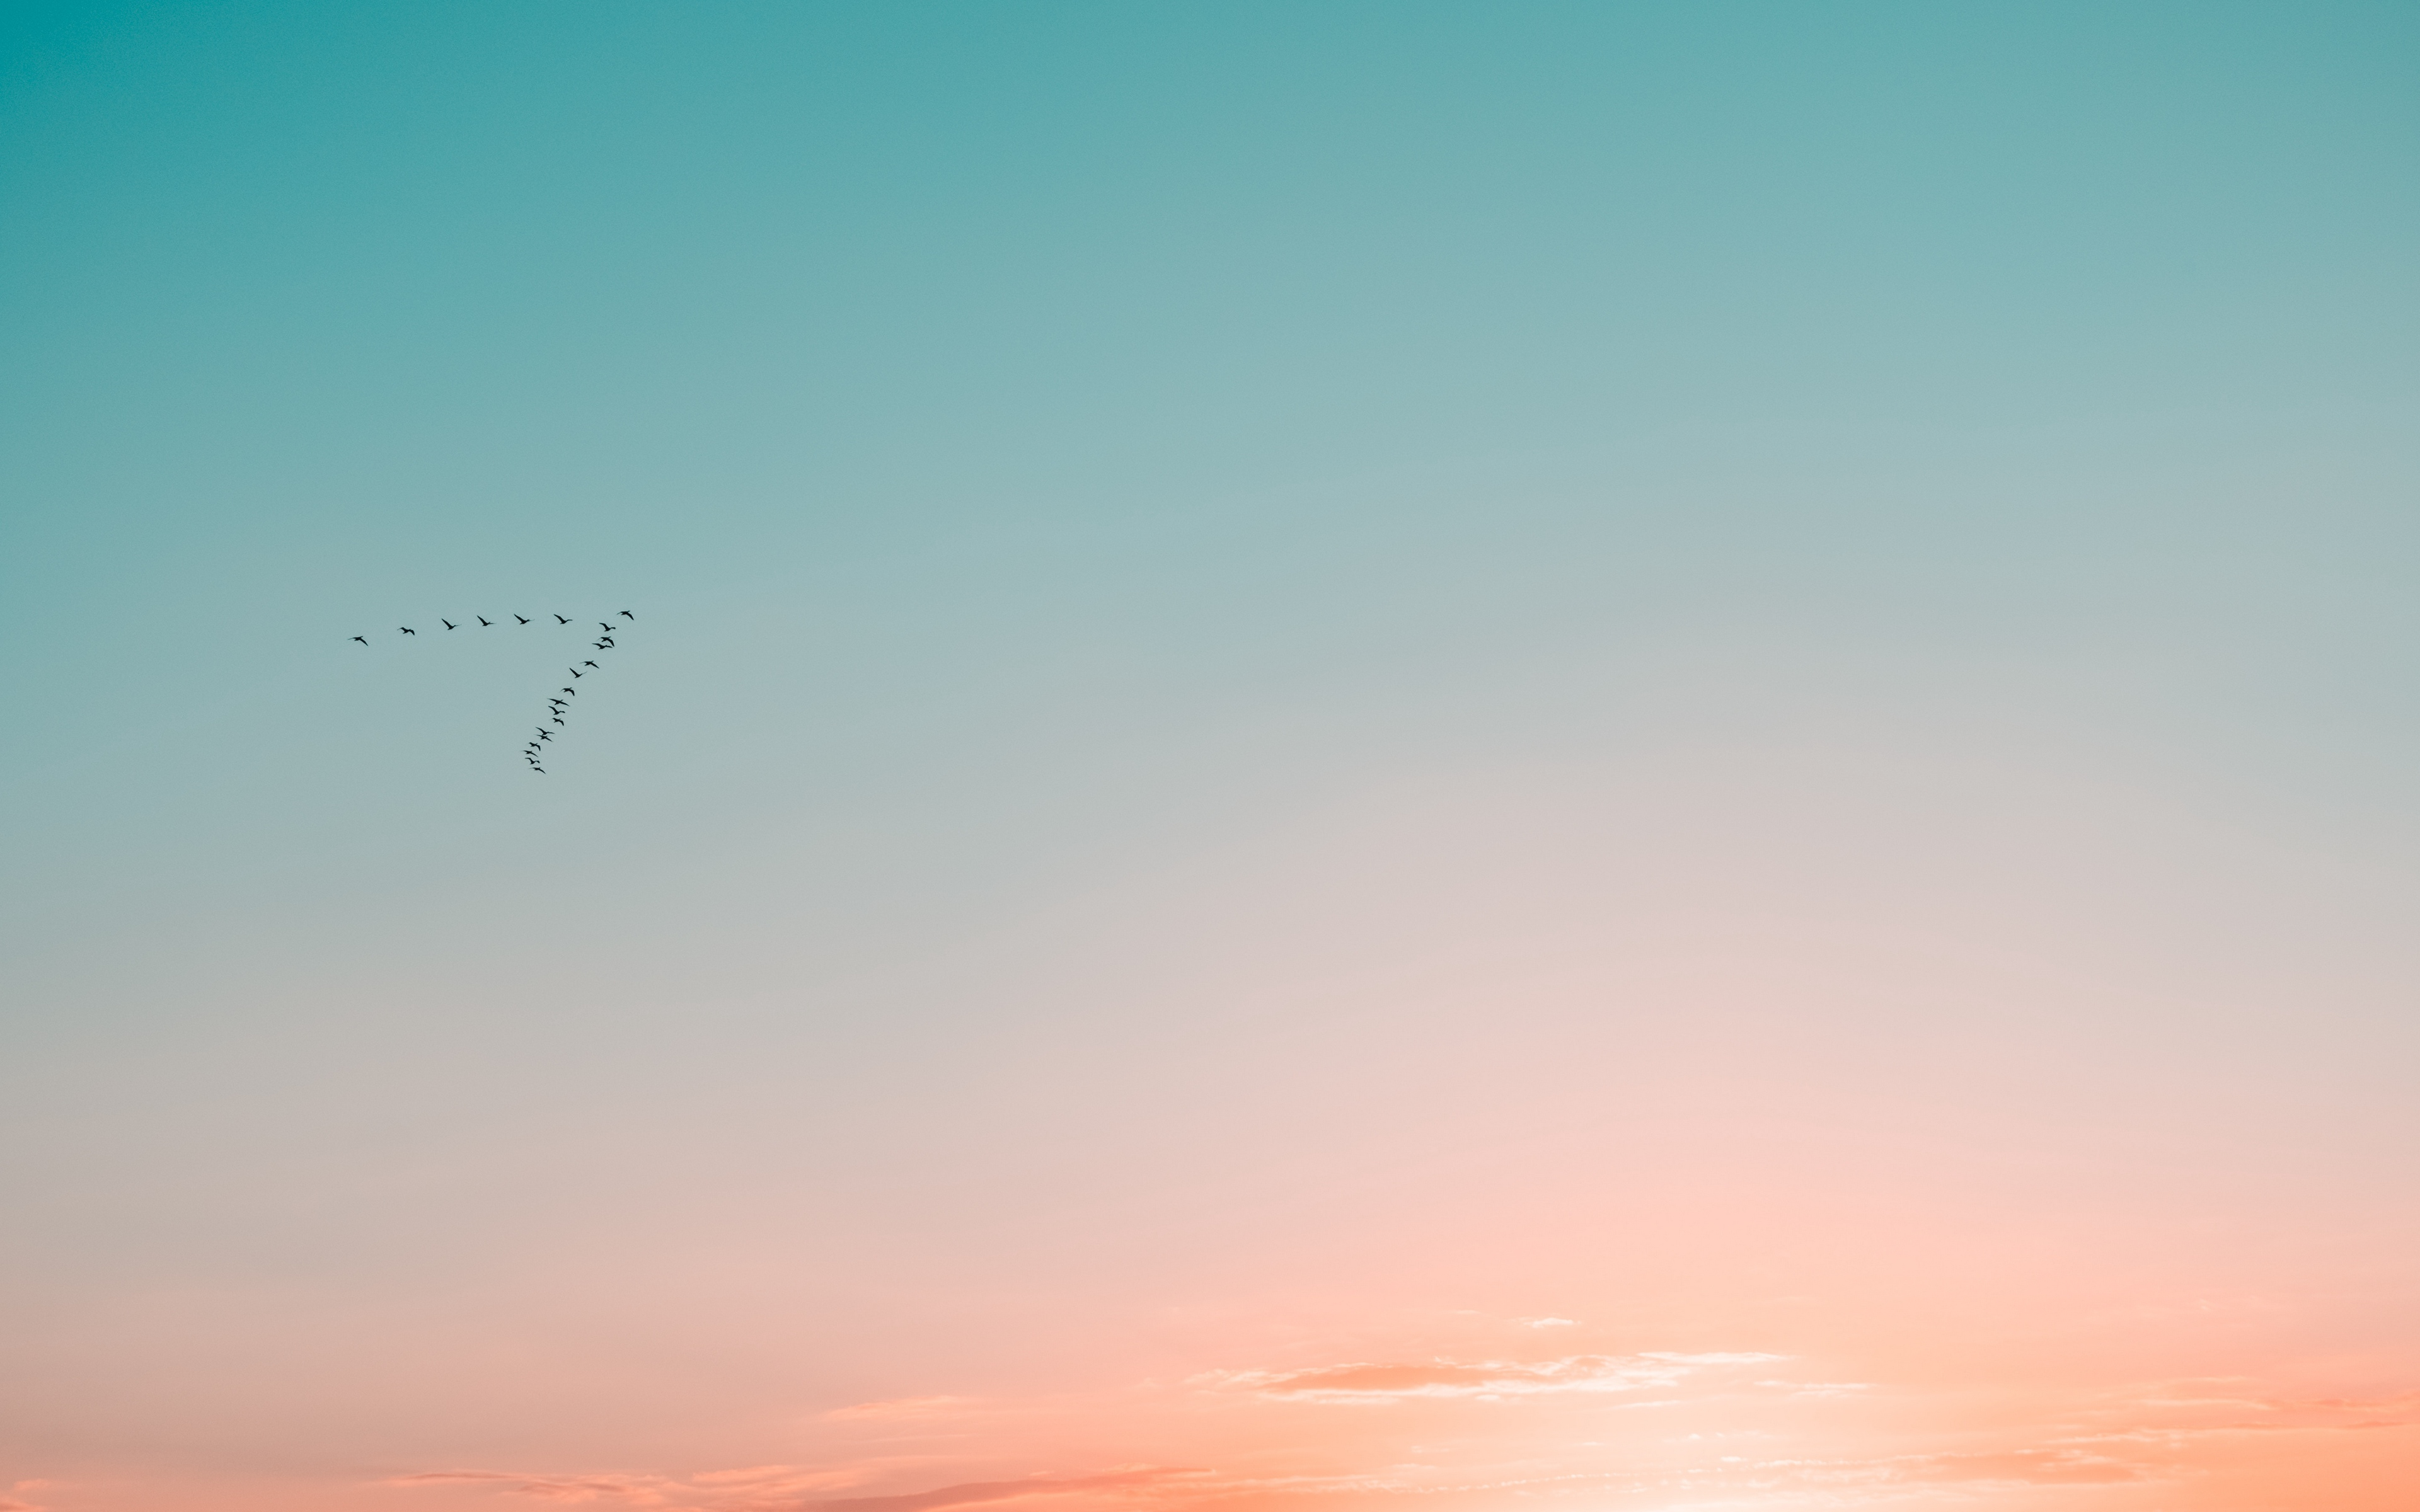 Wallpaper Birds flying in pastel sky